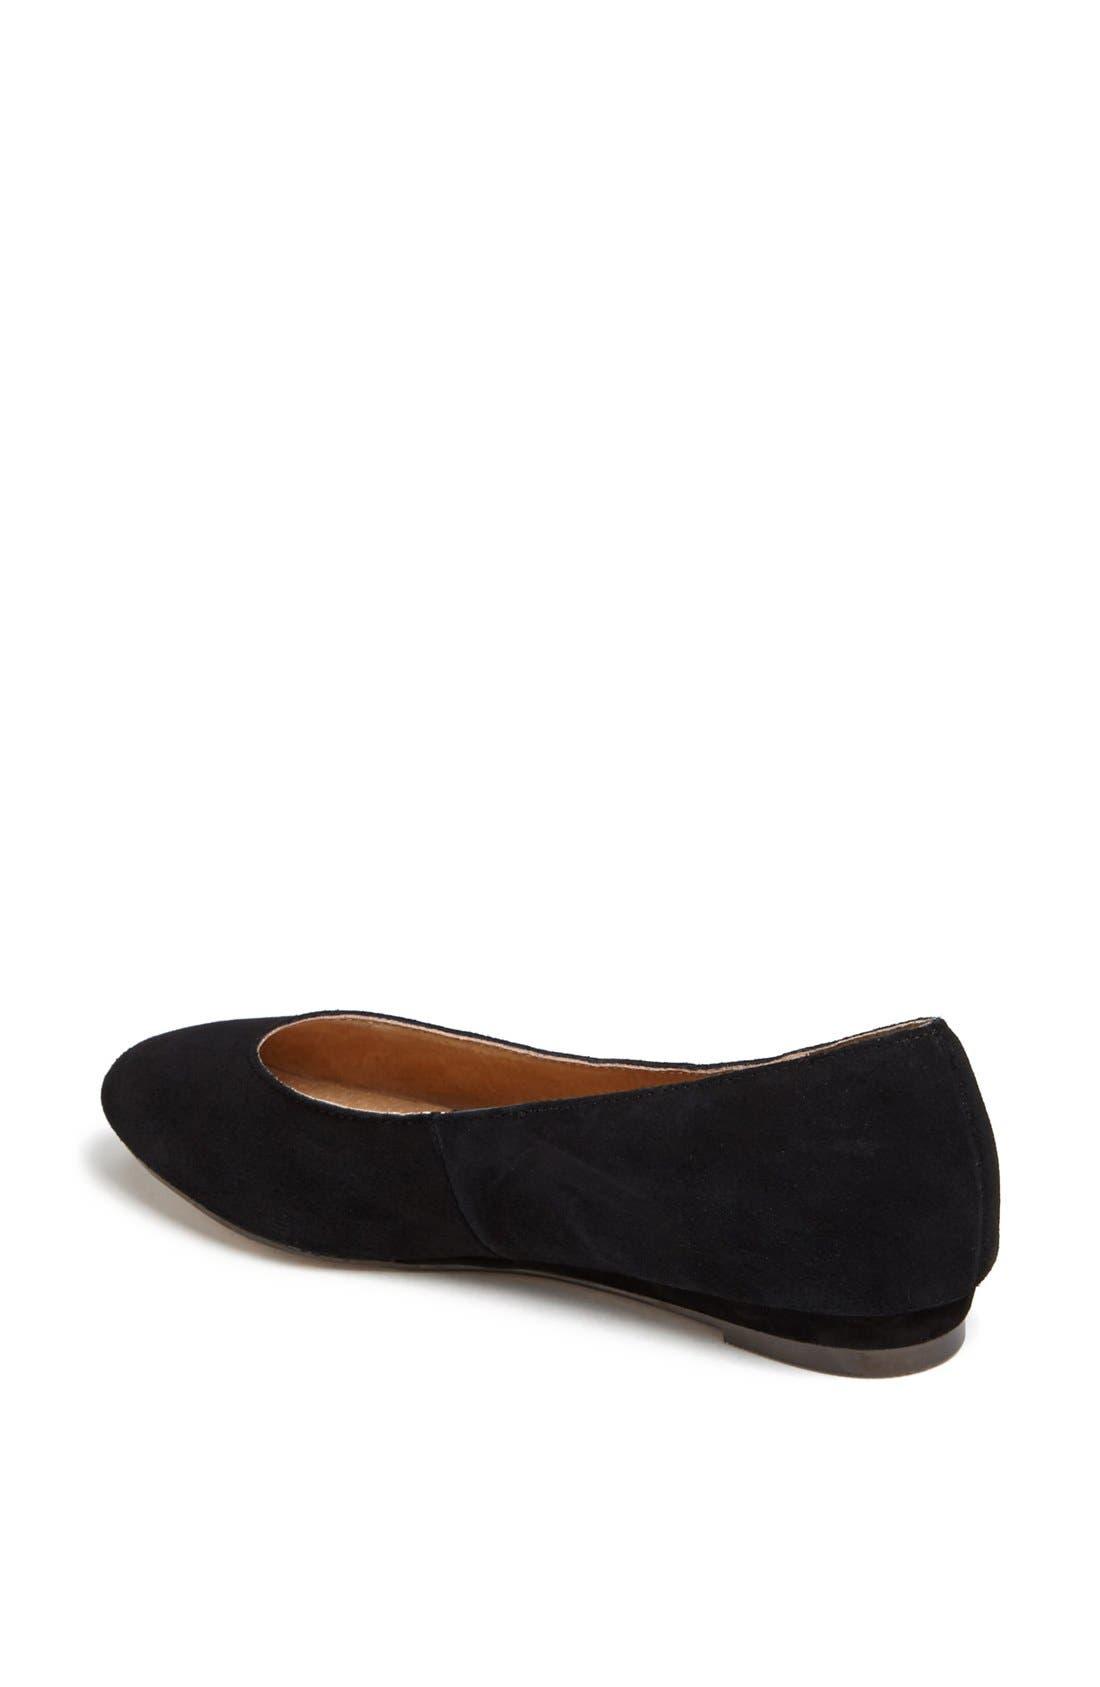 Alternate Image 2  - Topshop 'Mello Mini Wedge' Court Shoe